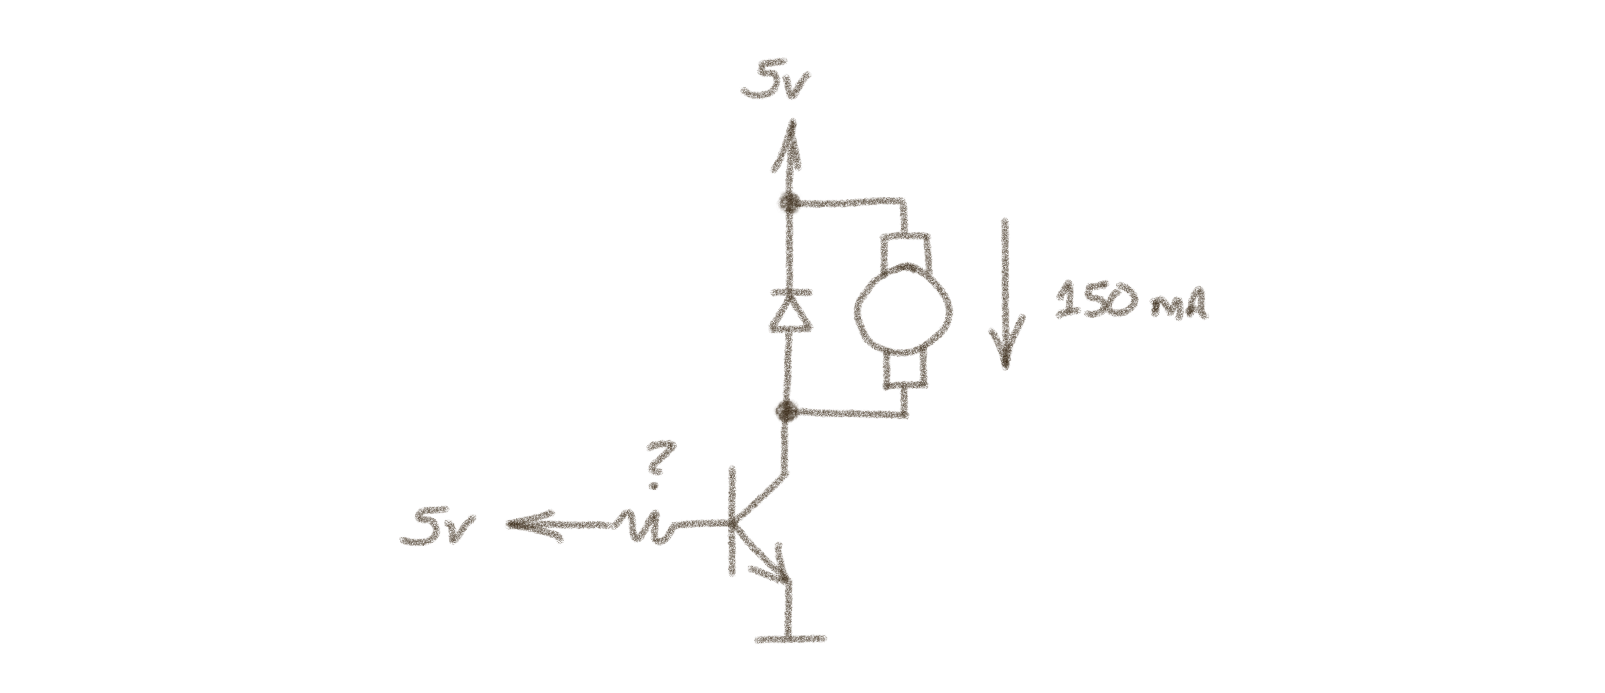 components_bjt-design-2.png